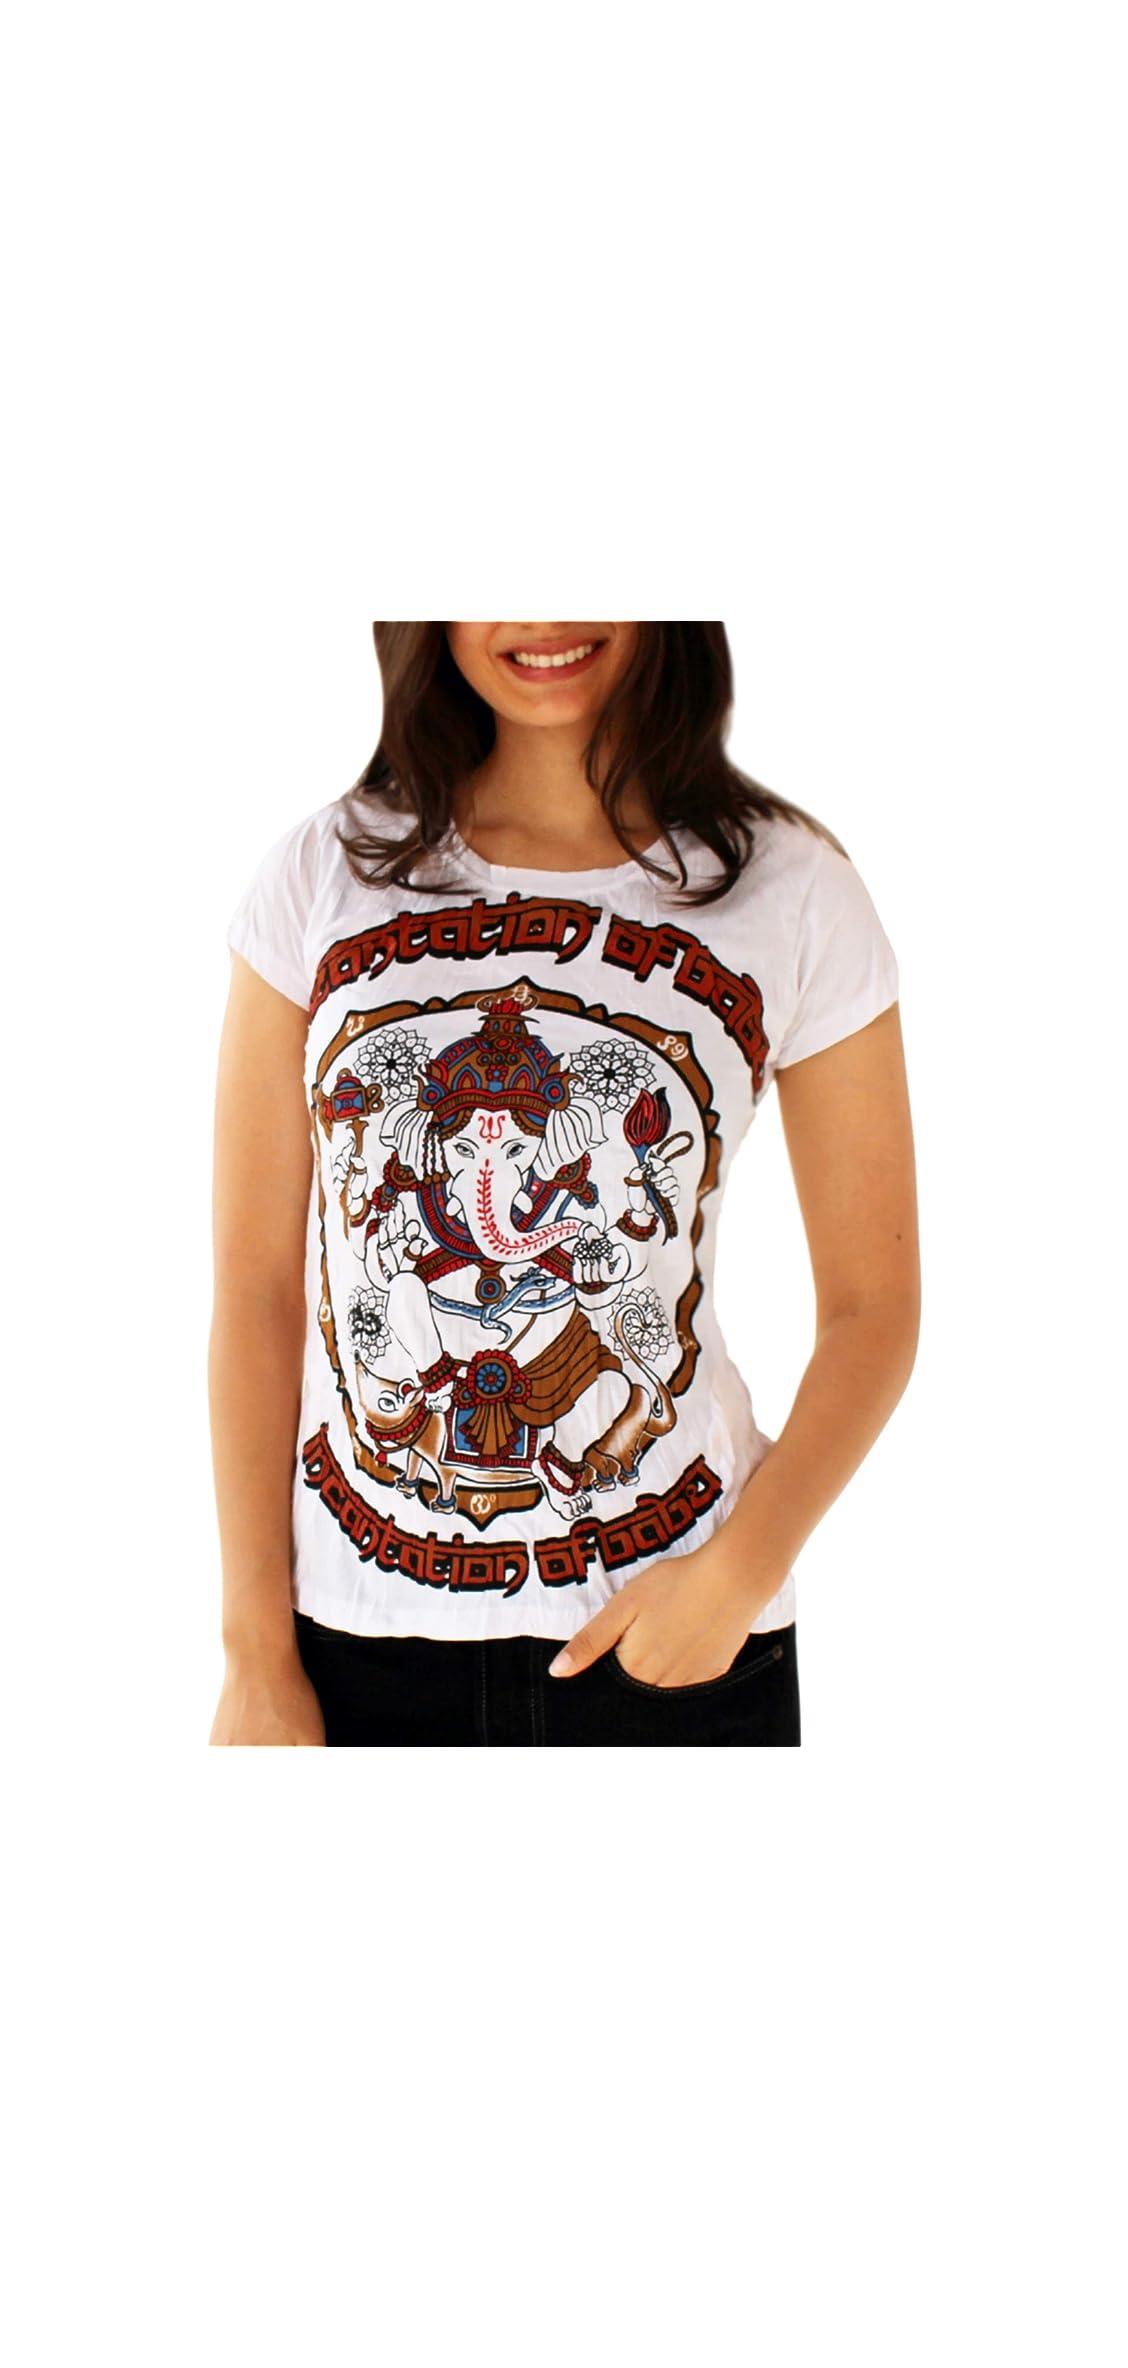 Women's Casual Ganesh Graphic T-shirt